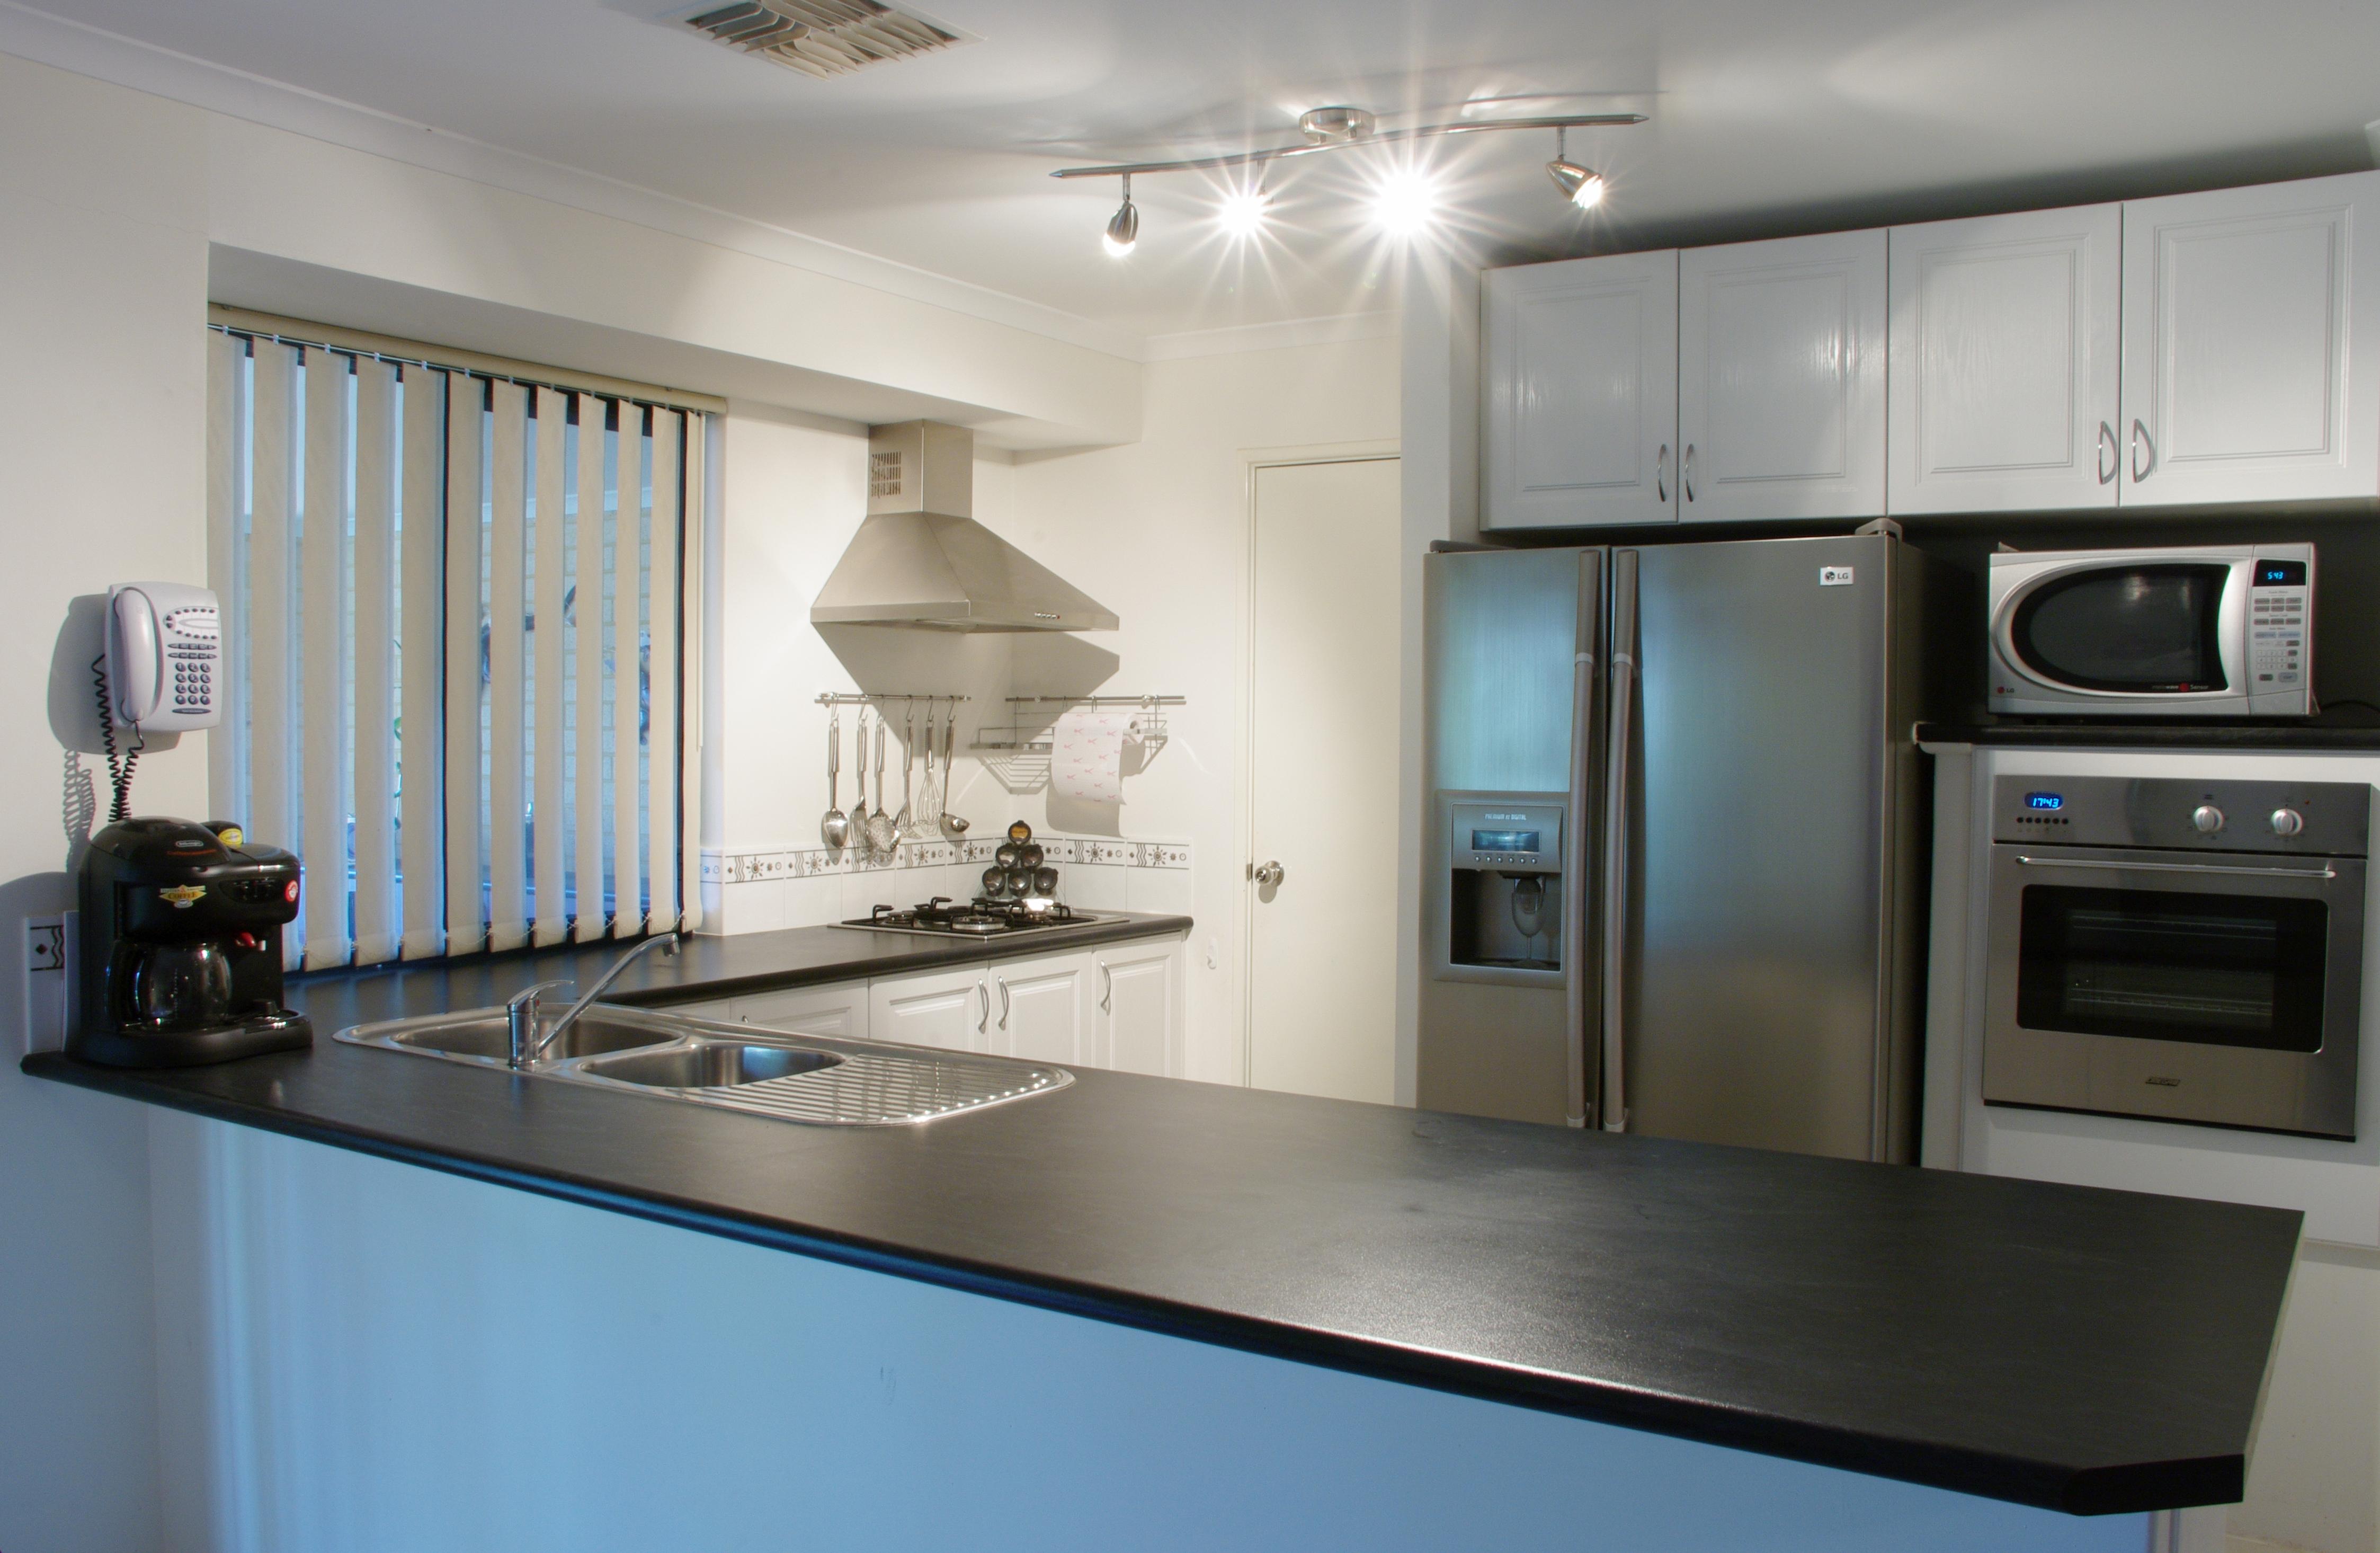 Ready made kitchen islands photo - 1